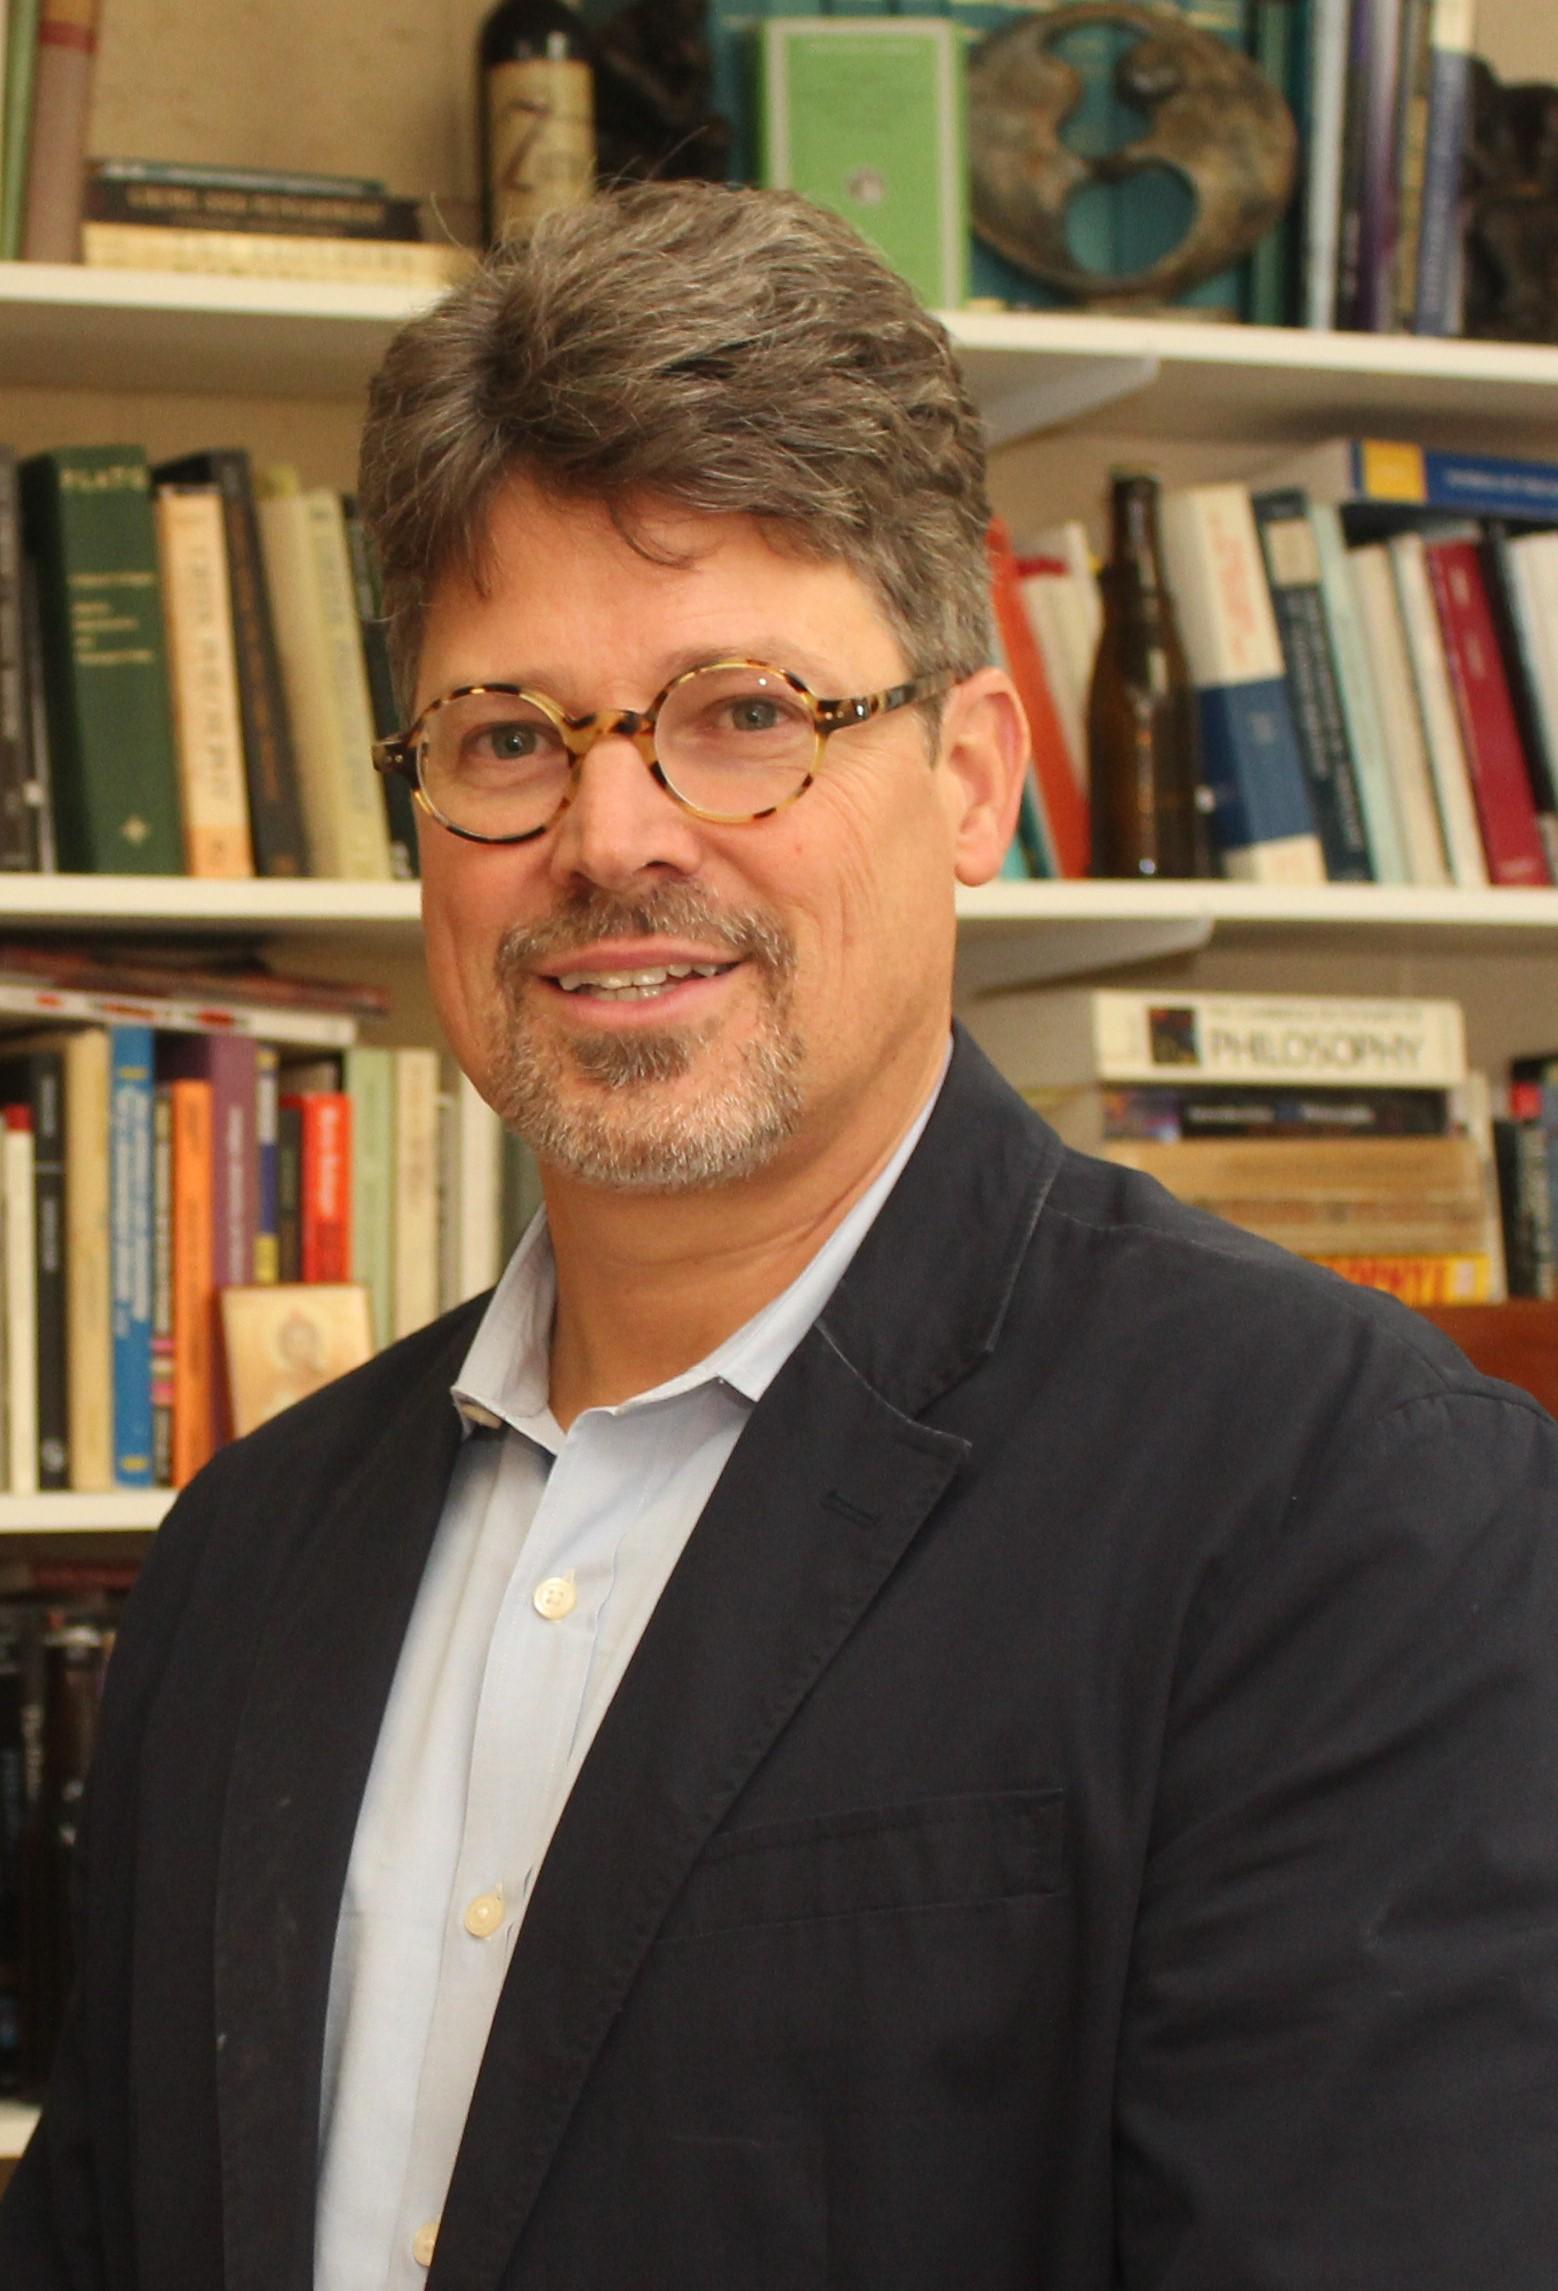 Daniel Haggerty, Ph.D. (Photo by The University of Scranton)